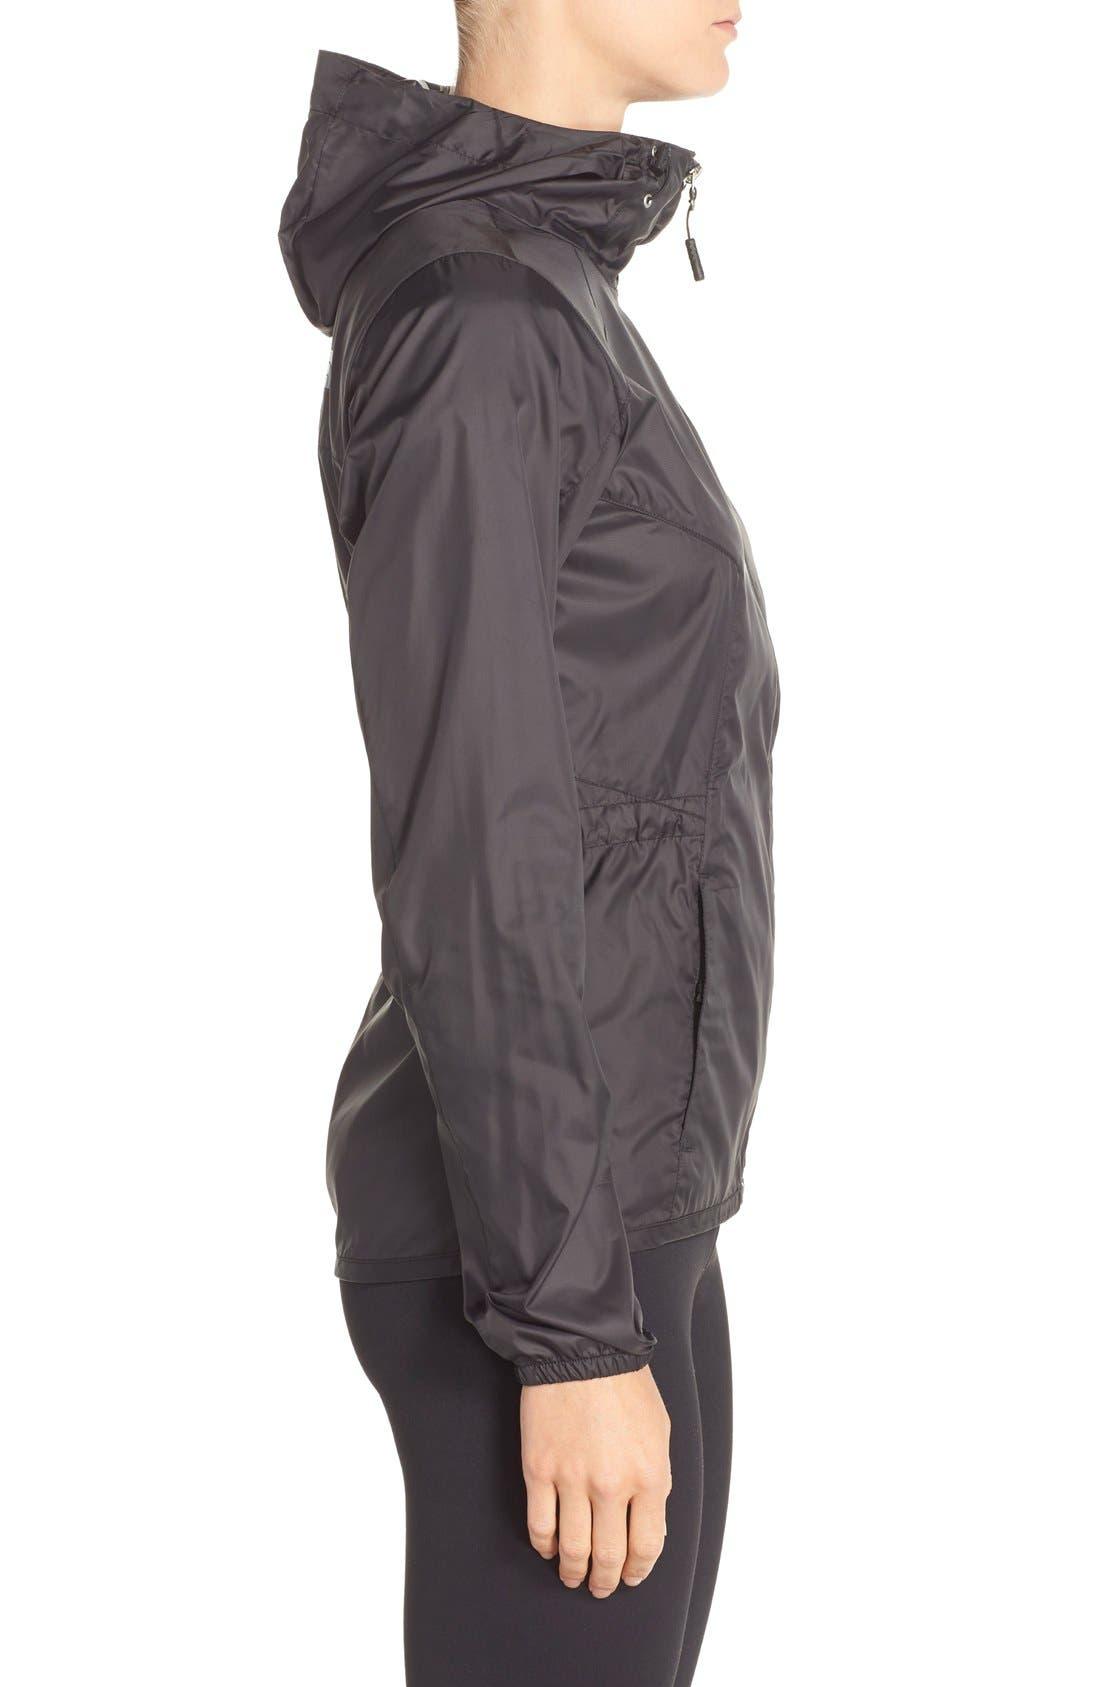 'Flyweight' Hooded Jacket,                             Alternate thumbnail 3, color,                             Tnf Black